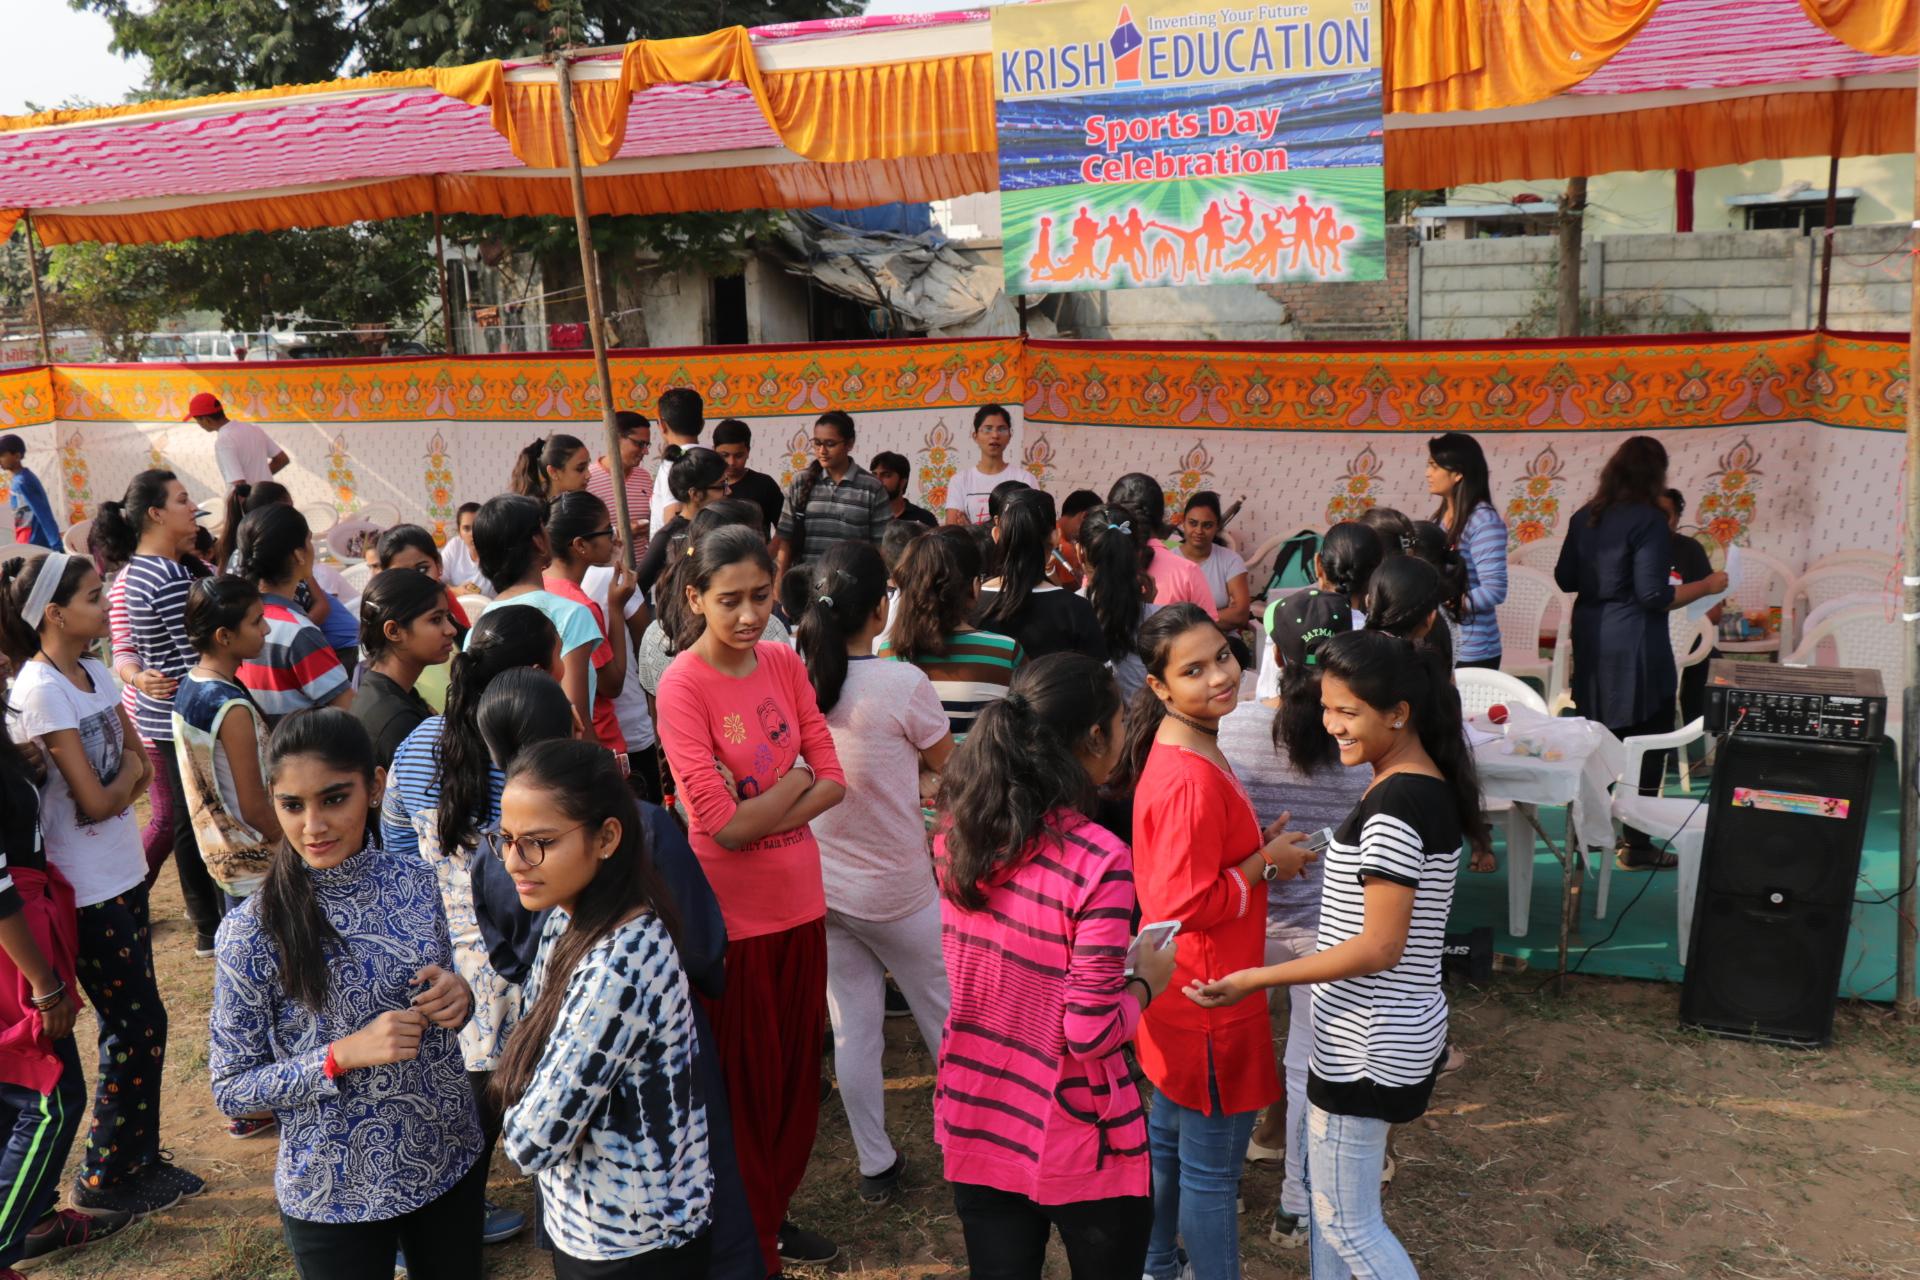 Krish Education in Chandkheda, Ahmedabad-382424 | Sulekha